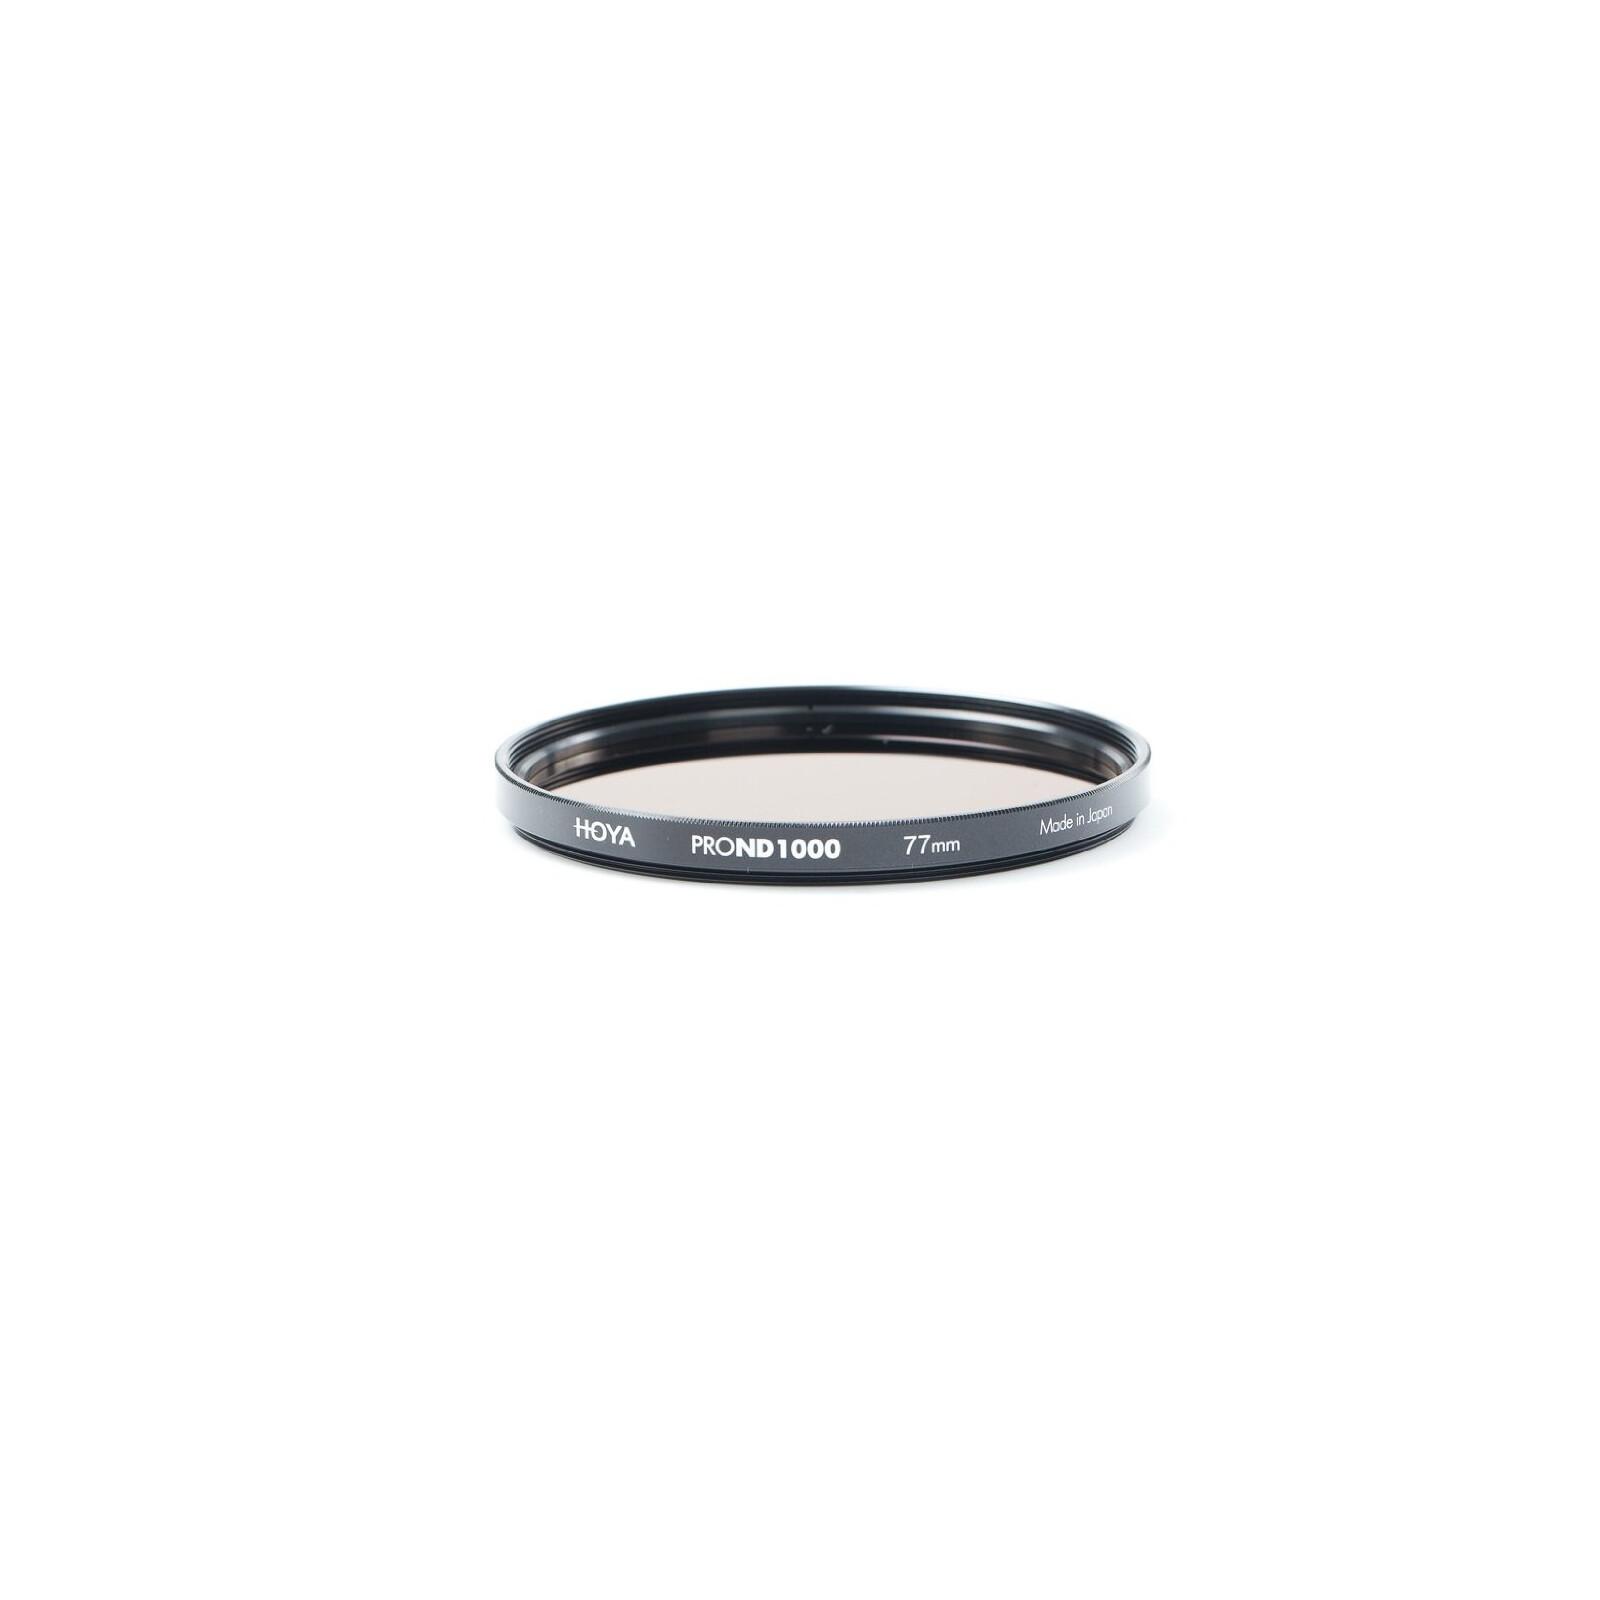 Hoya Grau PRO ND 1000 58mm